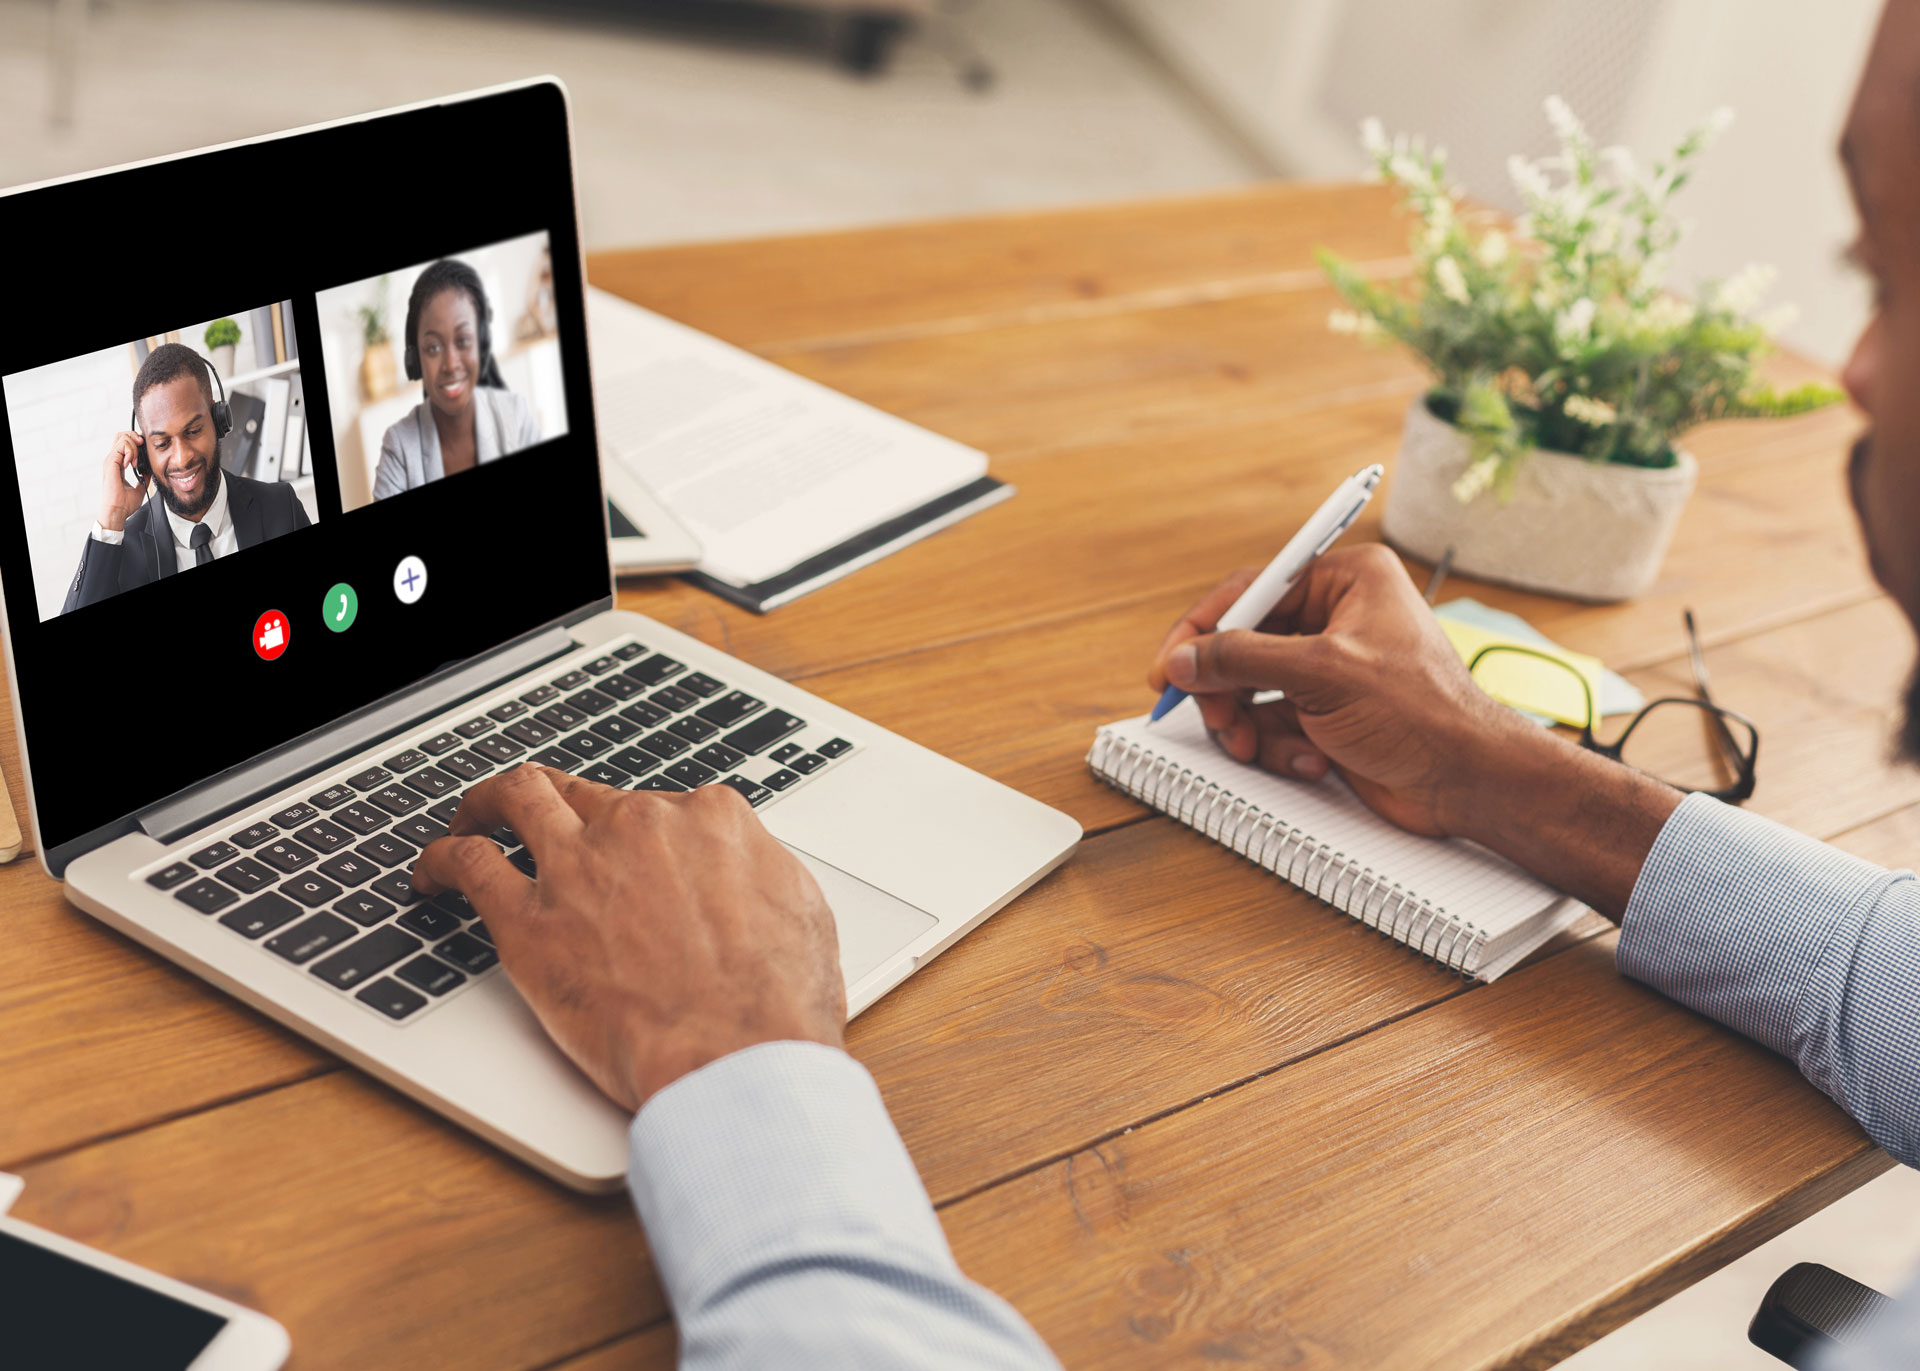 team-mates-having-video-call